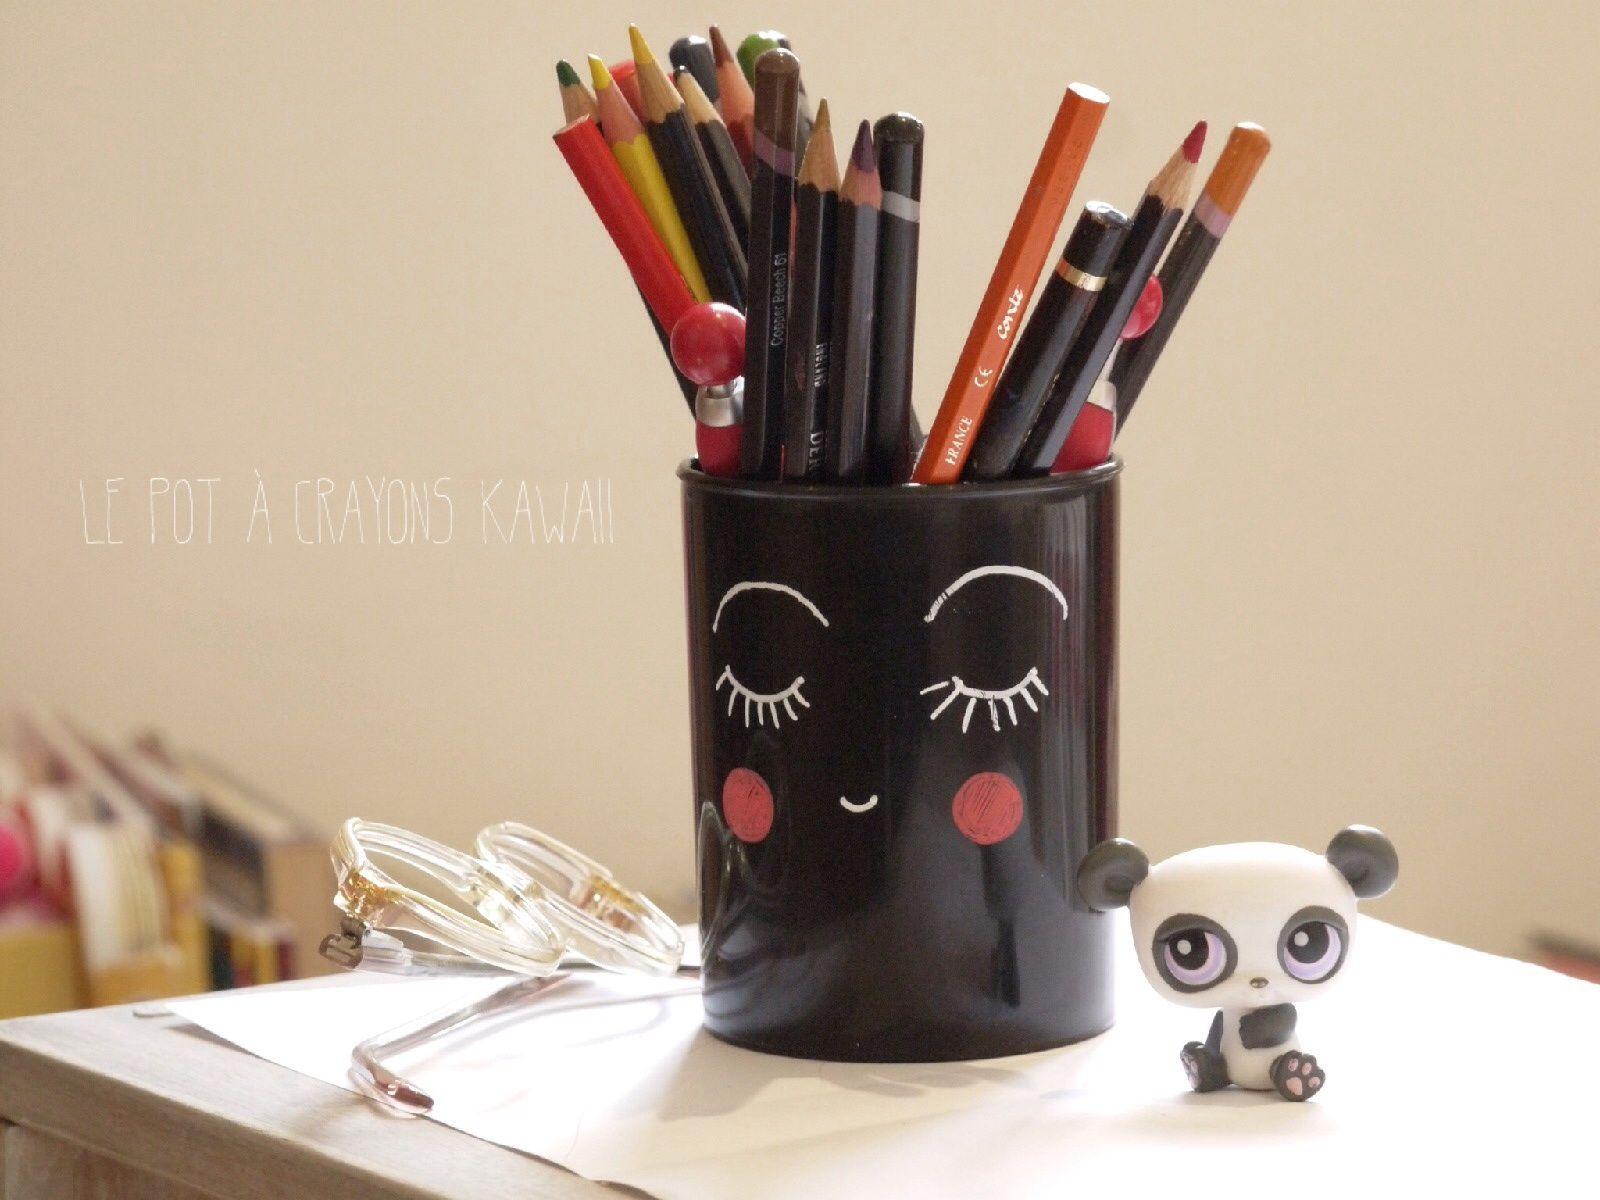 pot crayons kawaii pots crayons pinterest kawaii crayon et pots. Black Bedroom Furniture Sets. Home Design Ideas